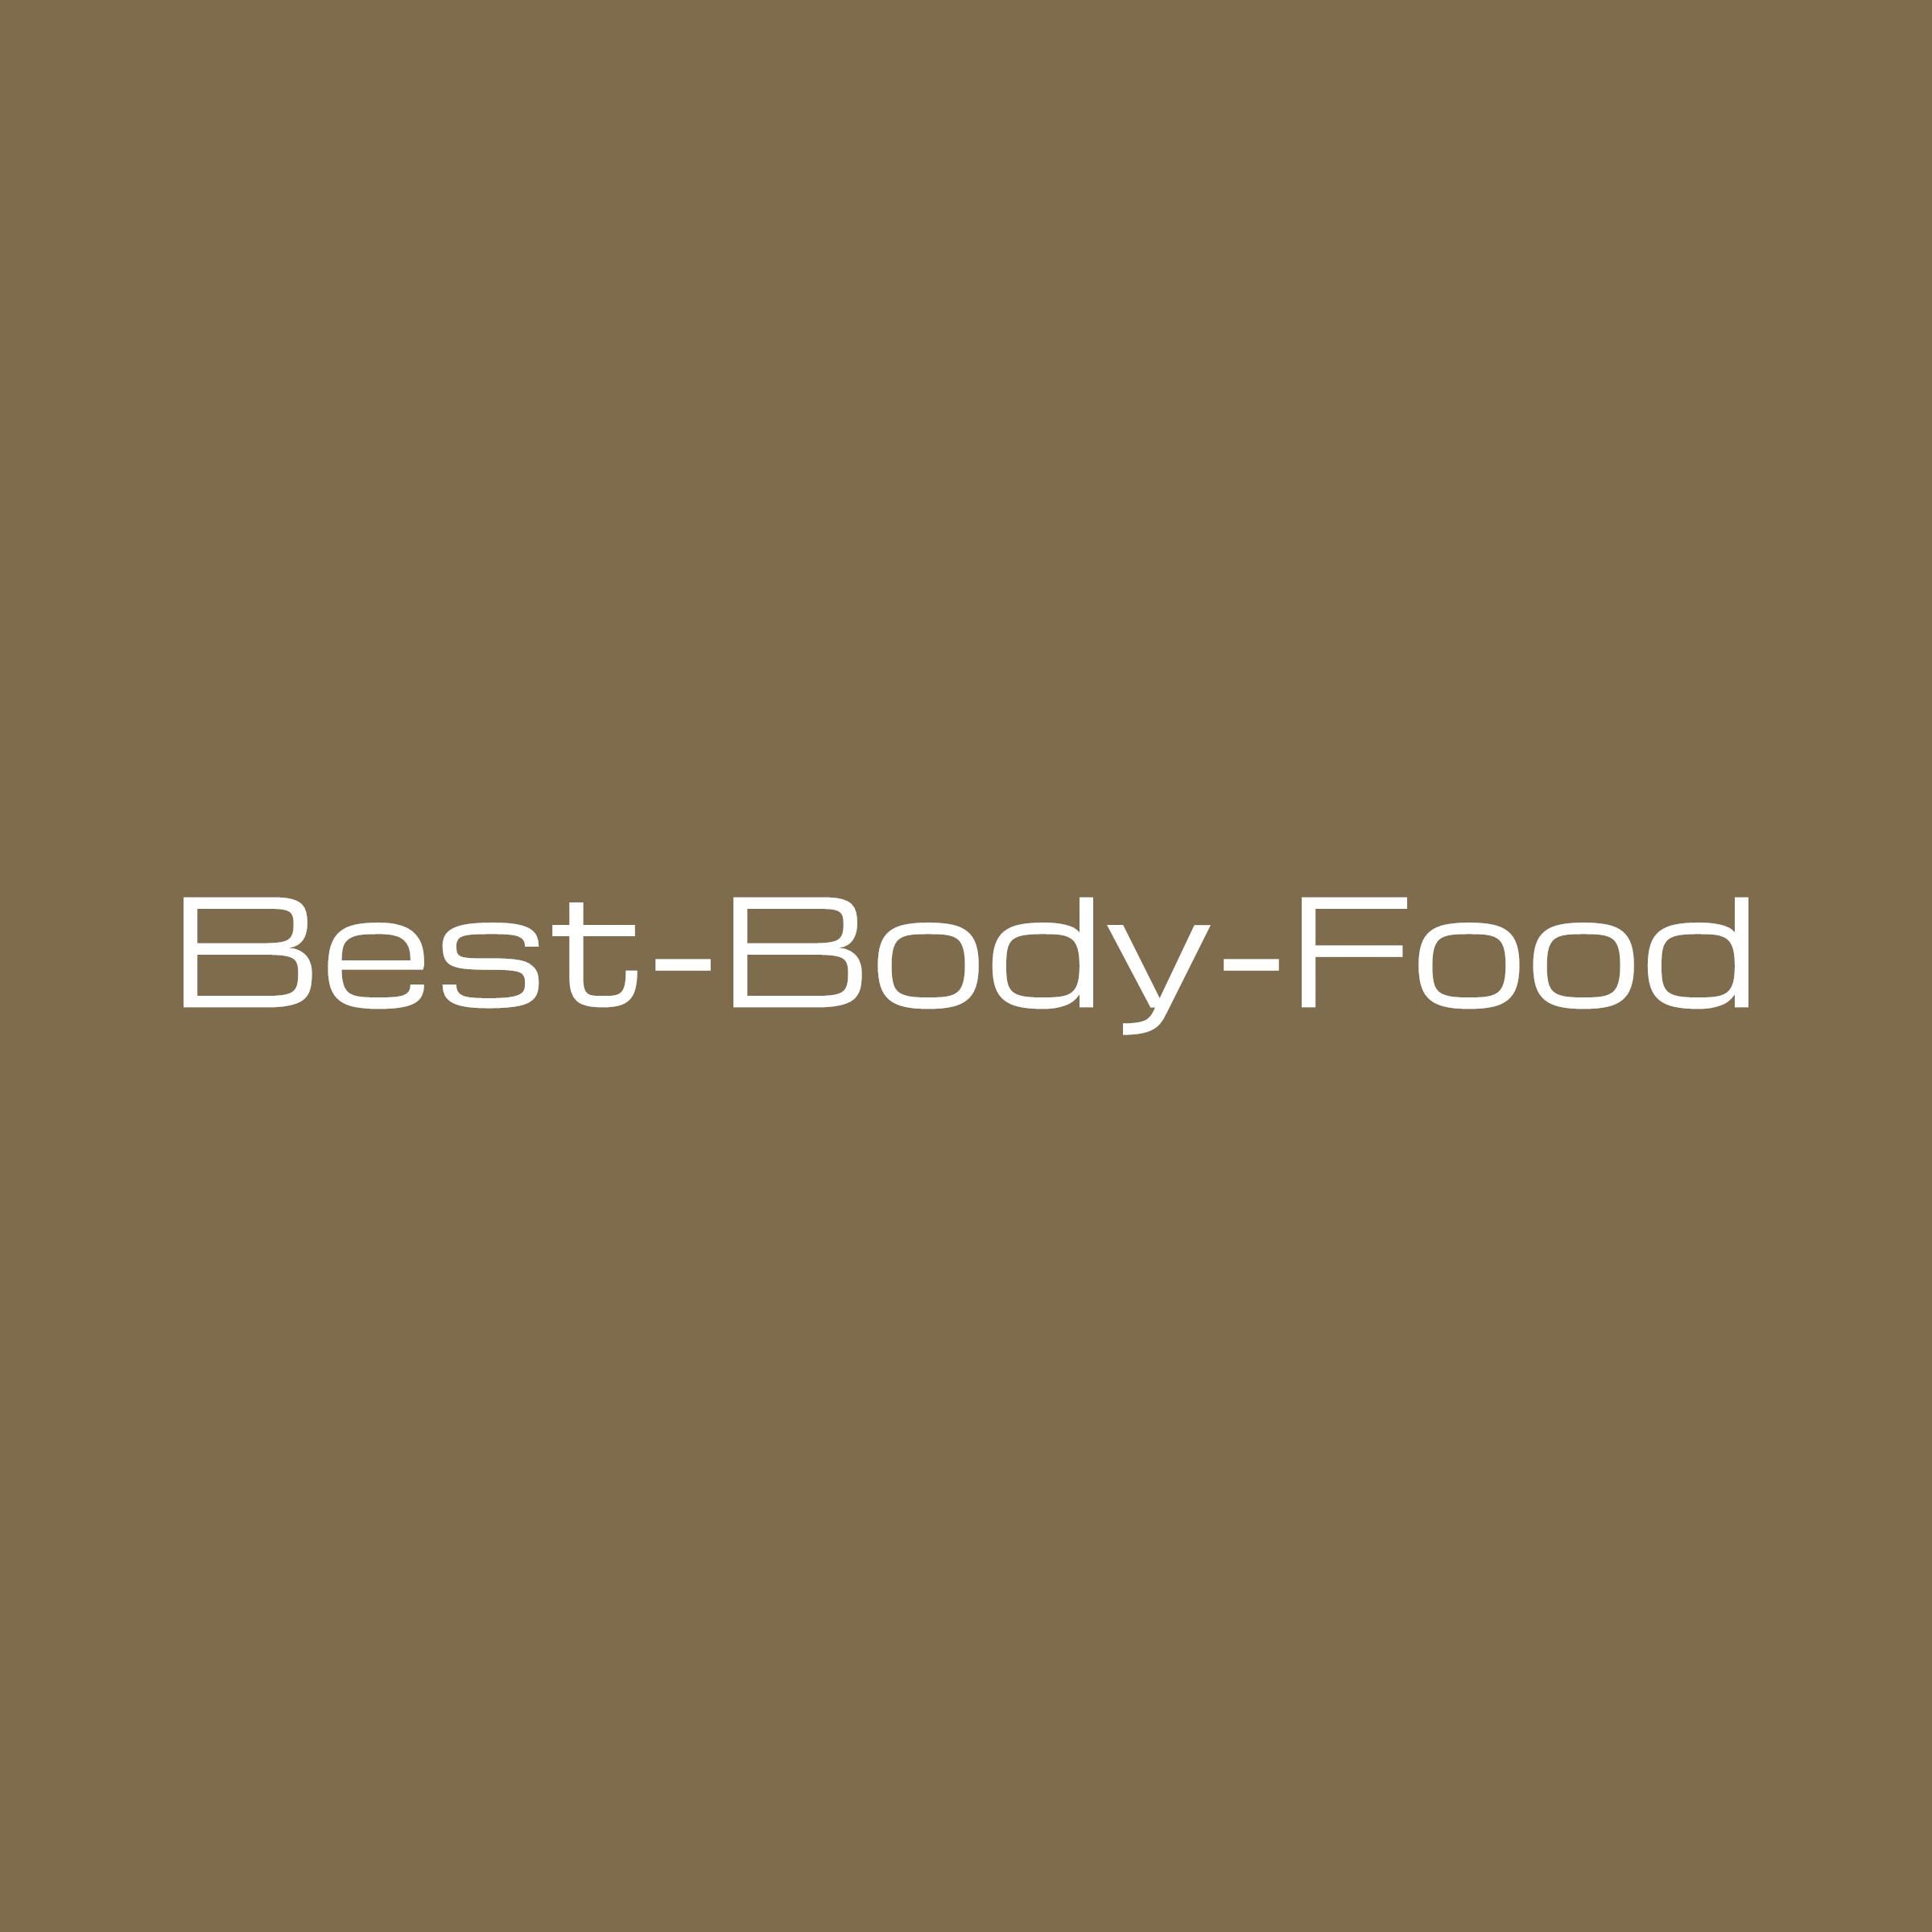 Best-Body-Food